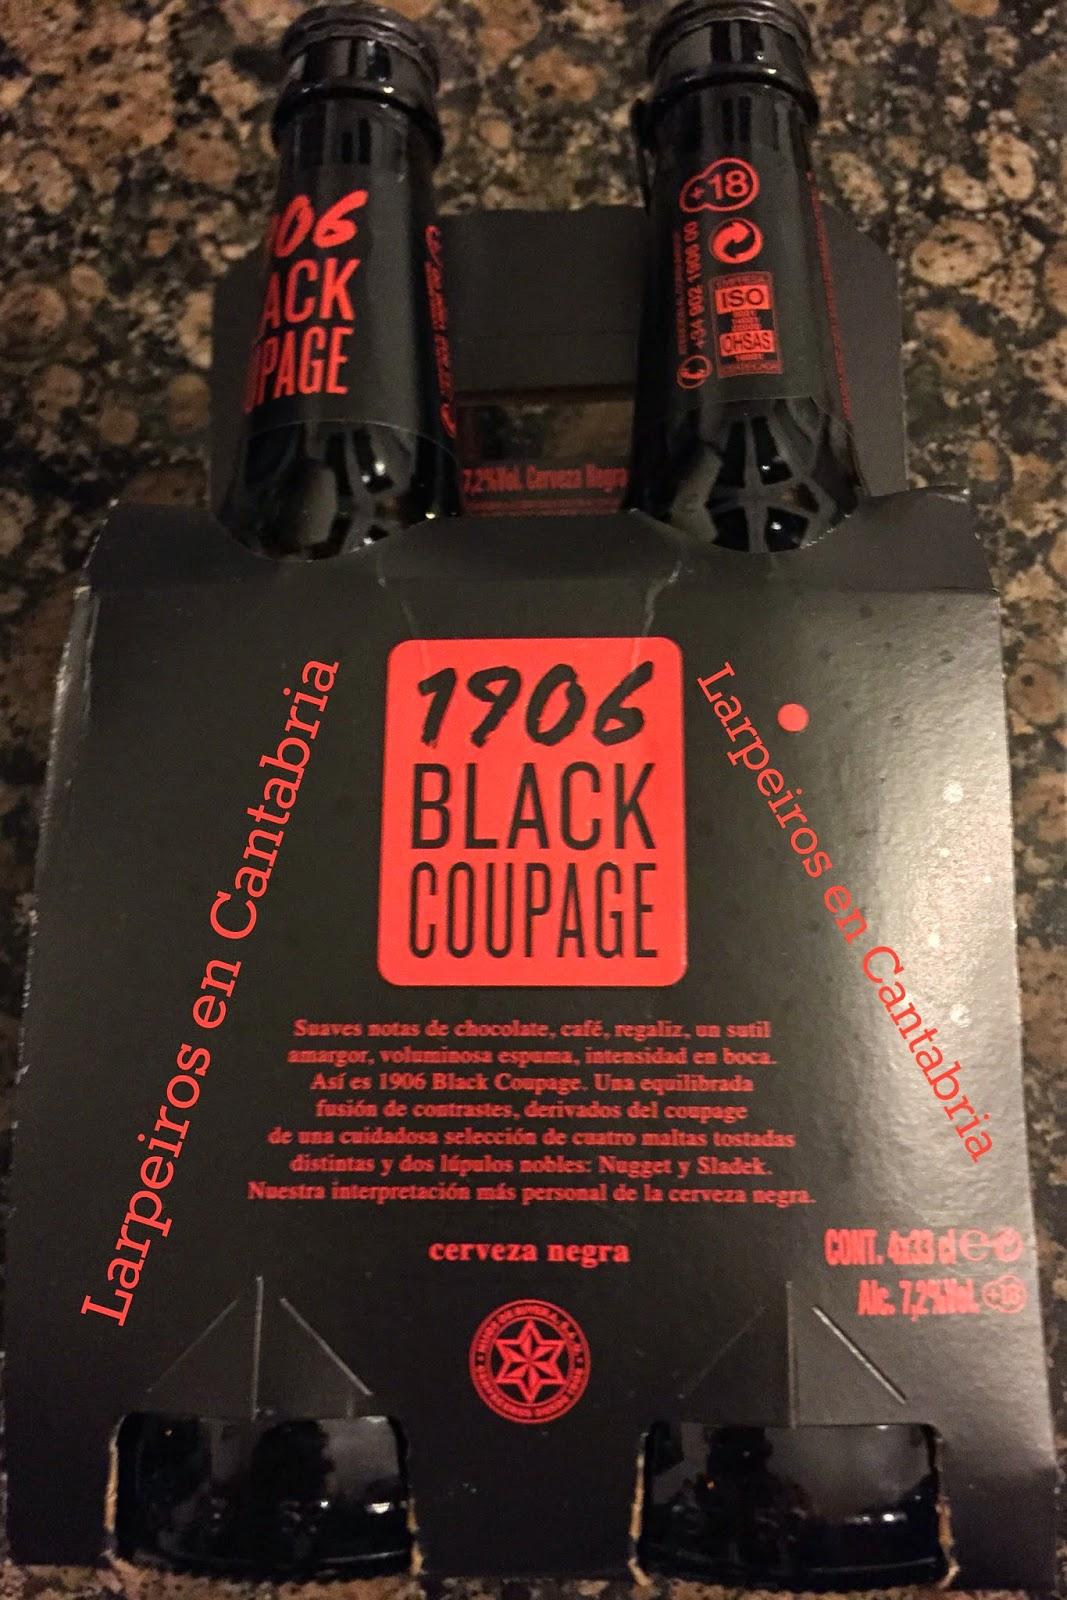 Cerveza 1906 Black Coupage de Estrella Galicia: La Oveja Negra de la familia Rivera